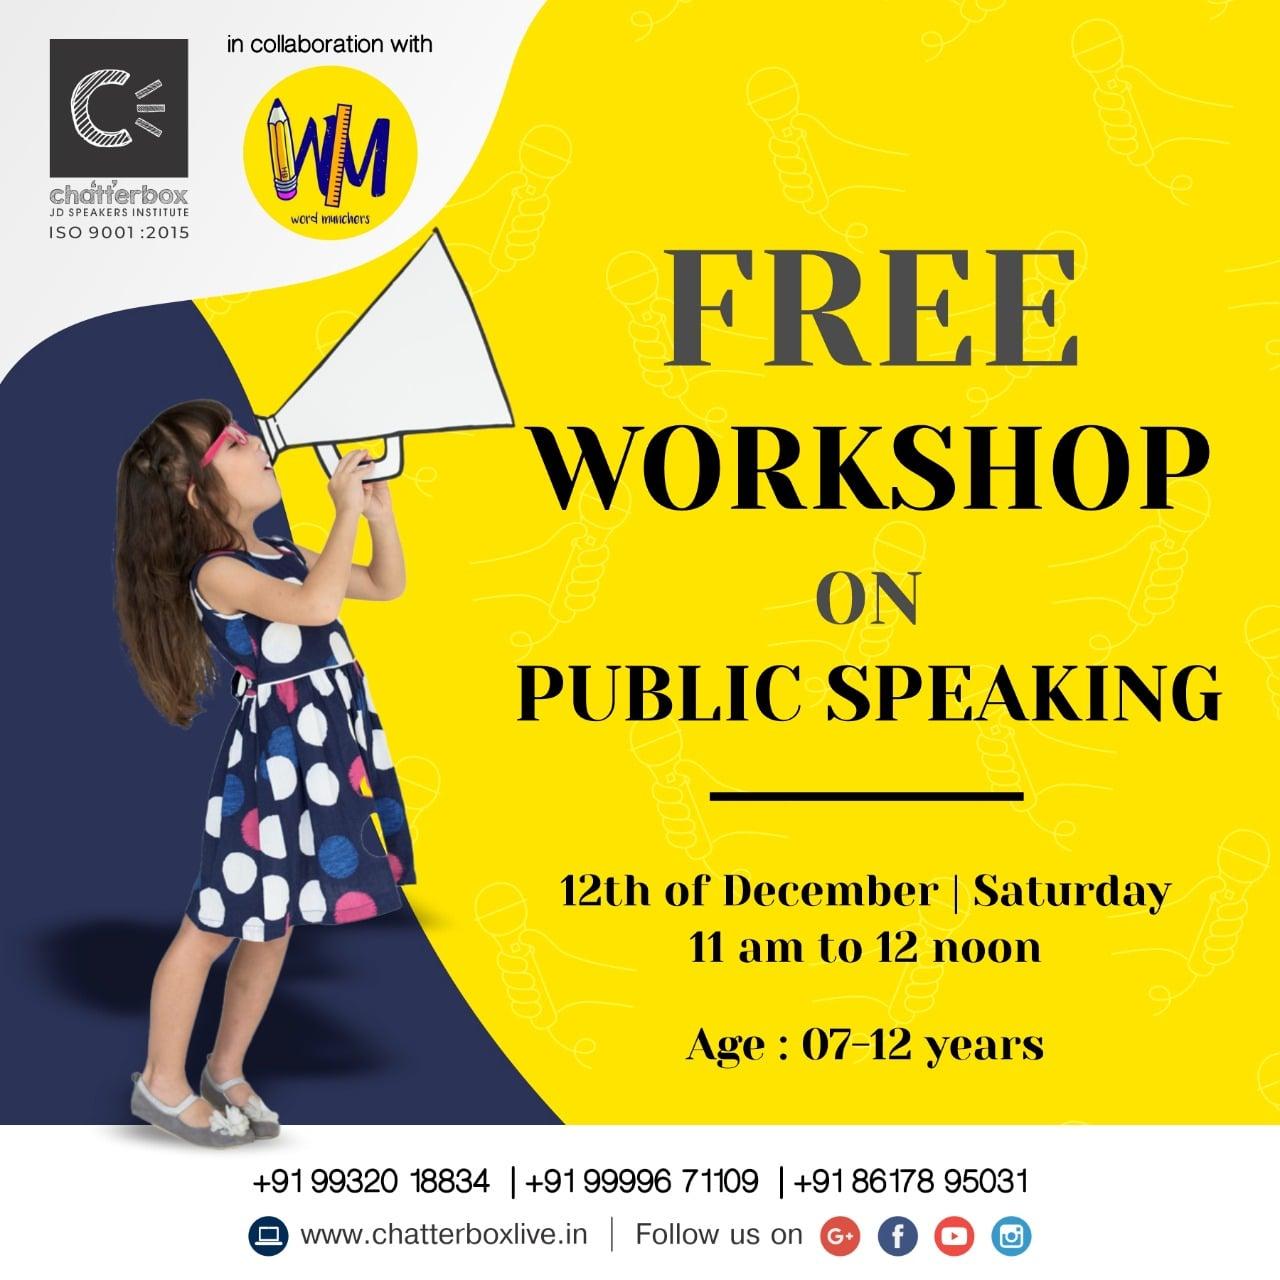 Free workshop on Public Speaking - Chatterboxlive